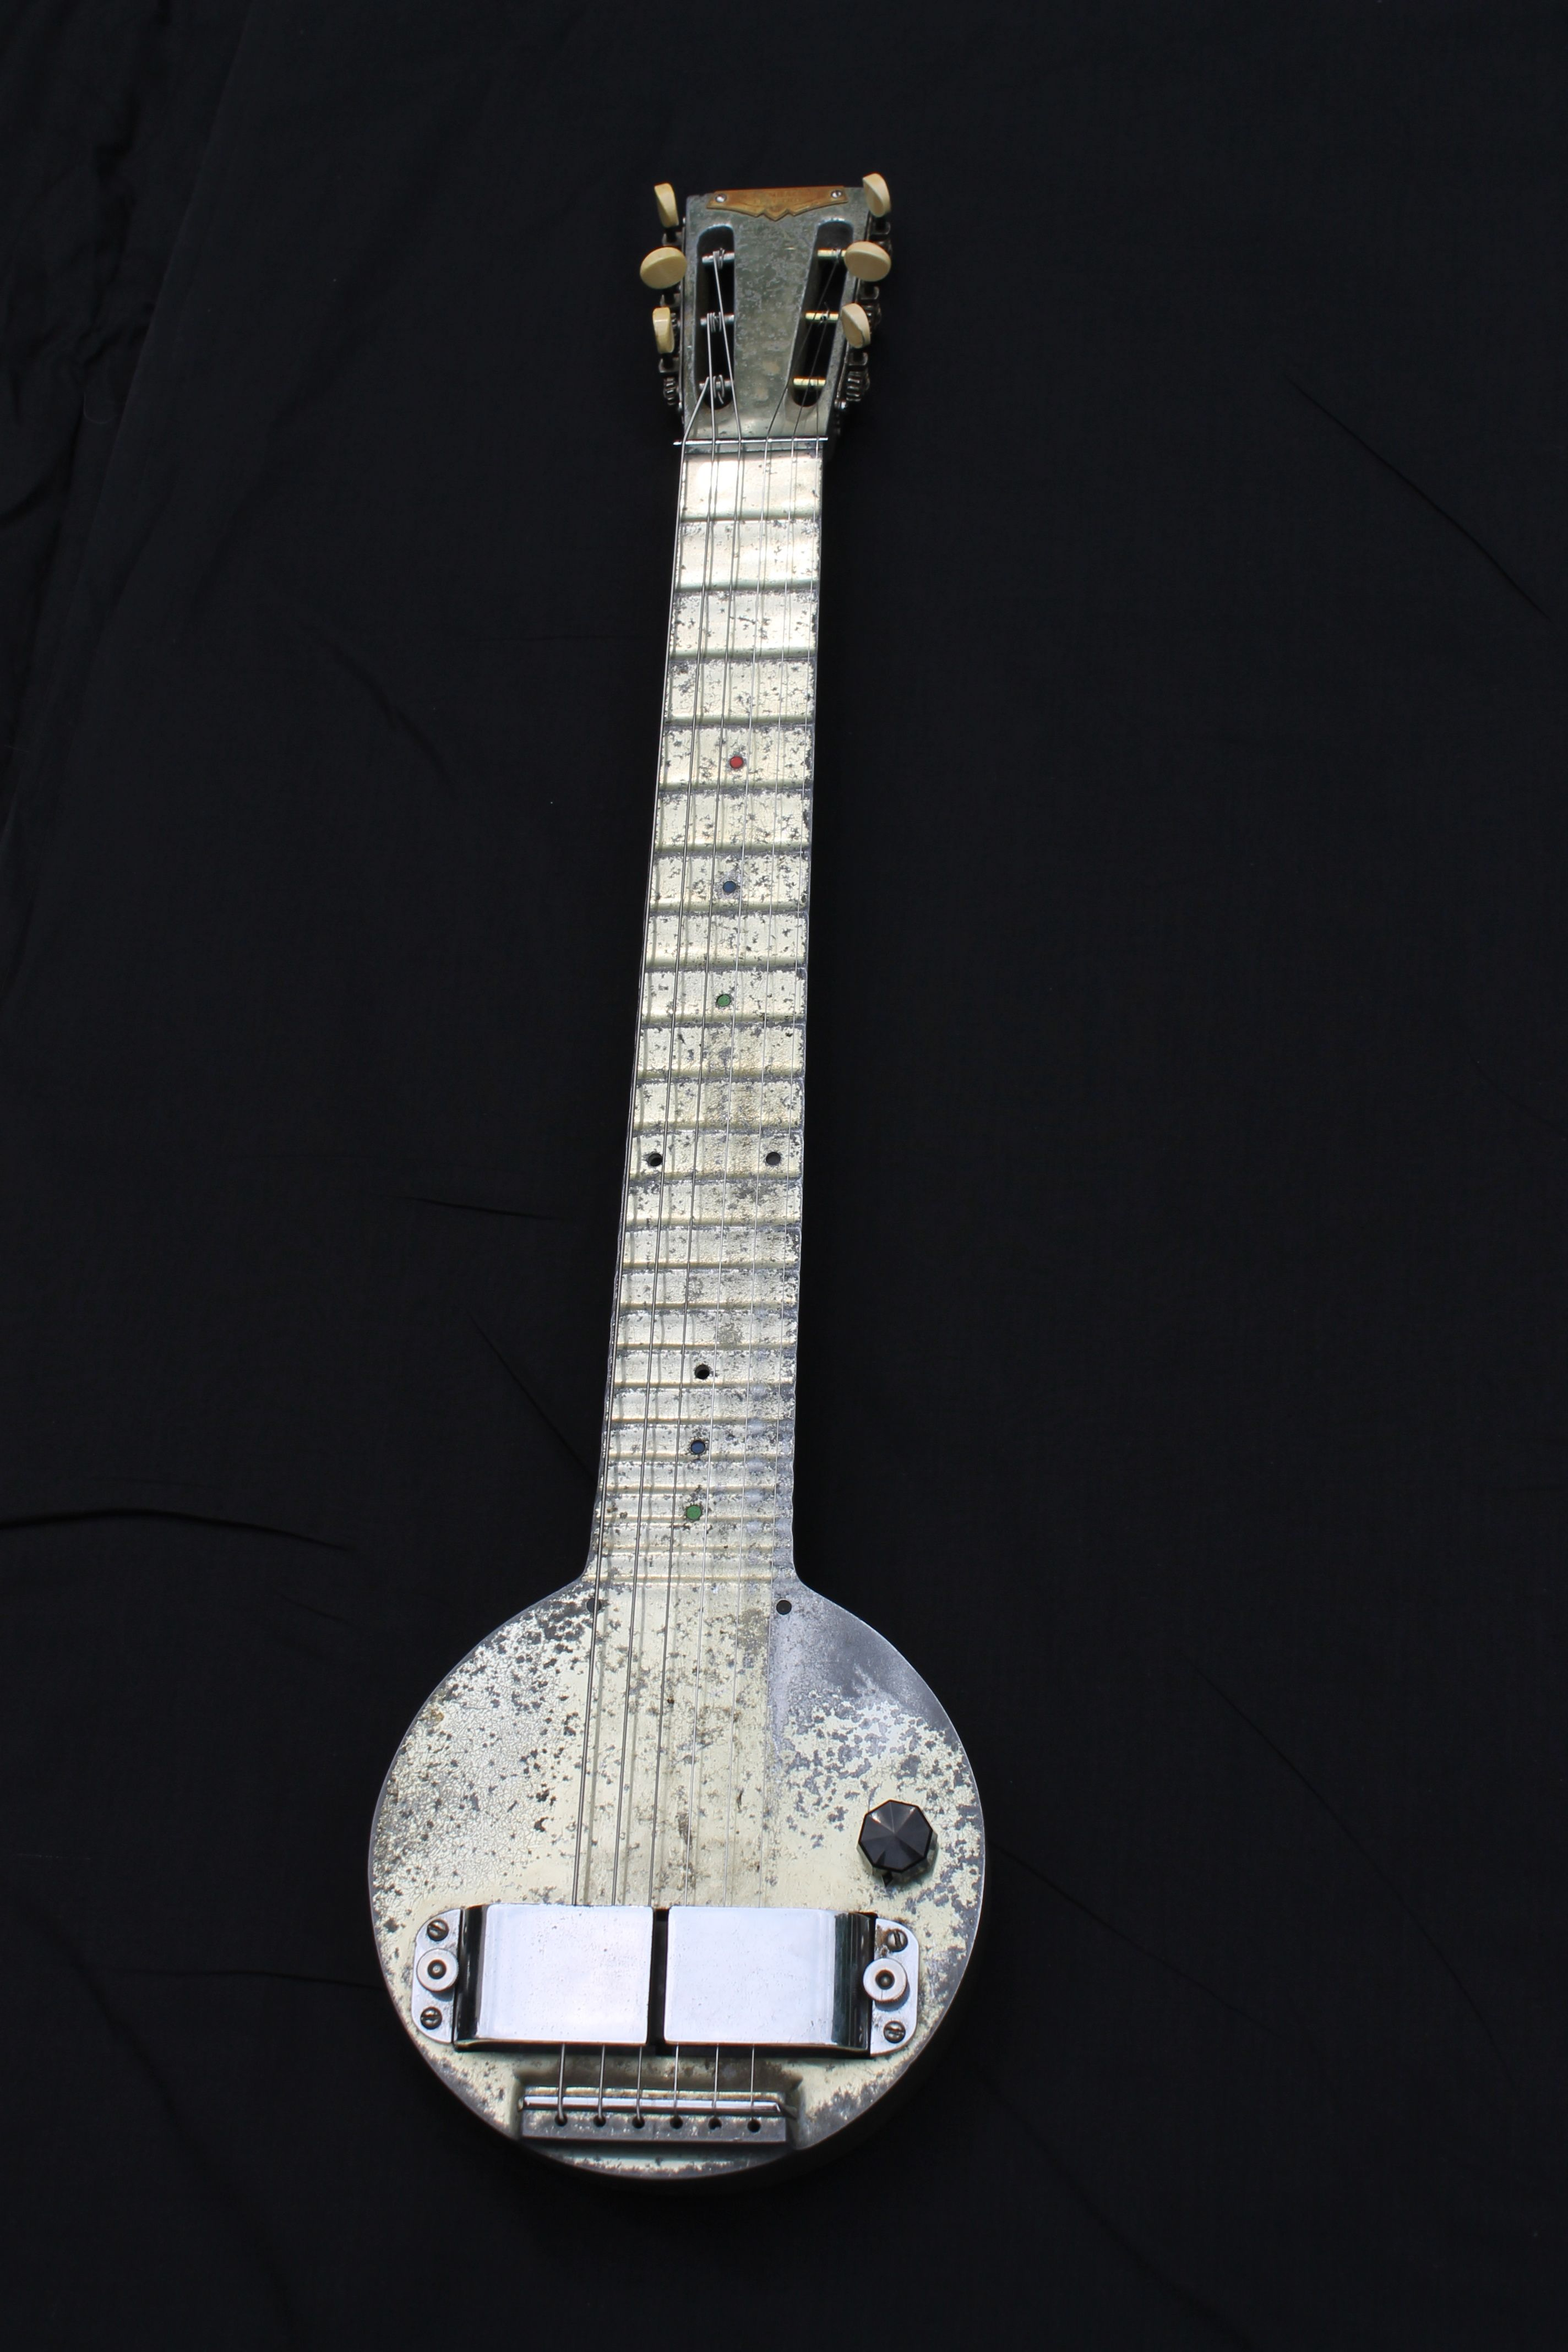 The First Electric Guitar An Aluminum Electro Frying Pan Lap